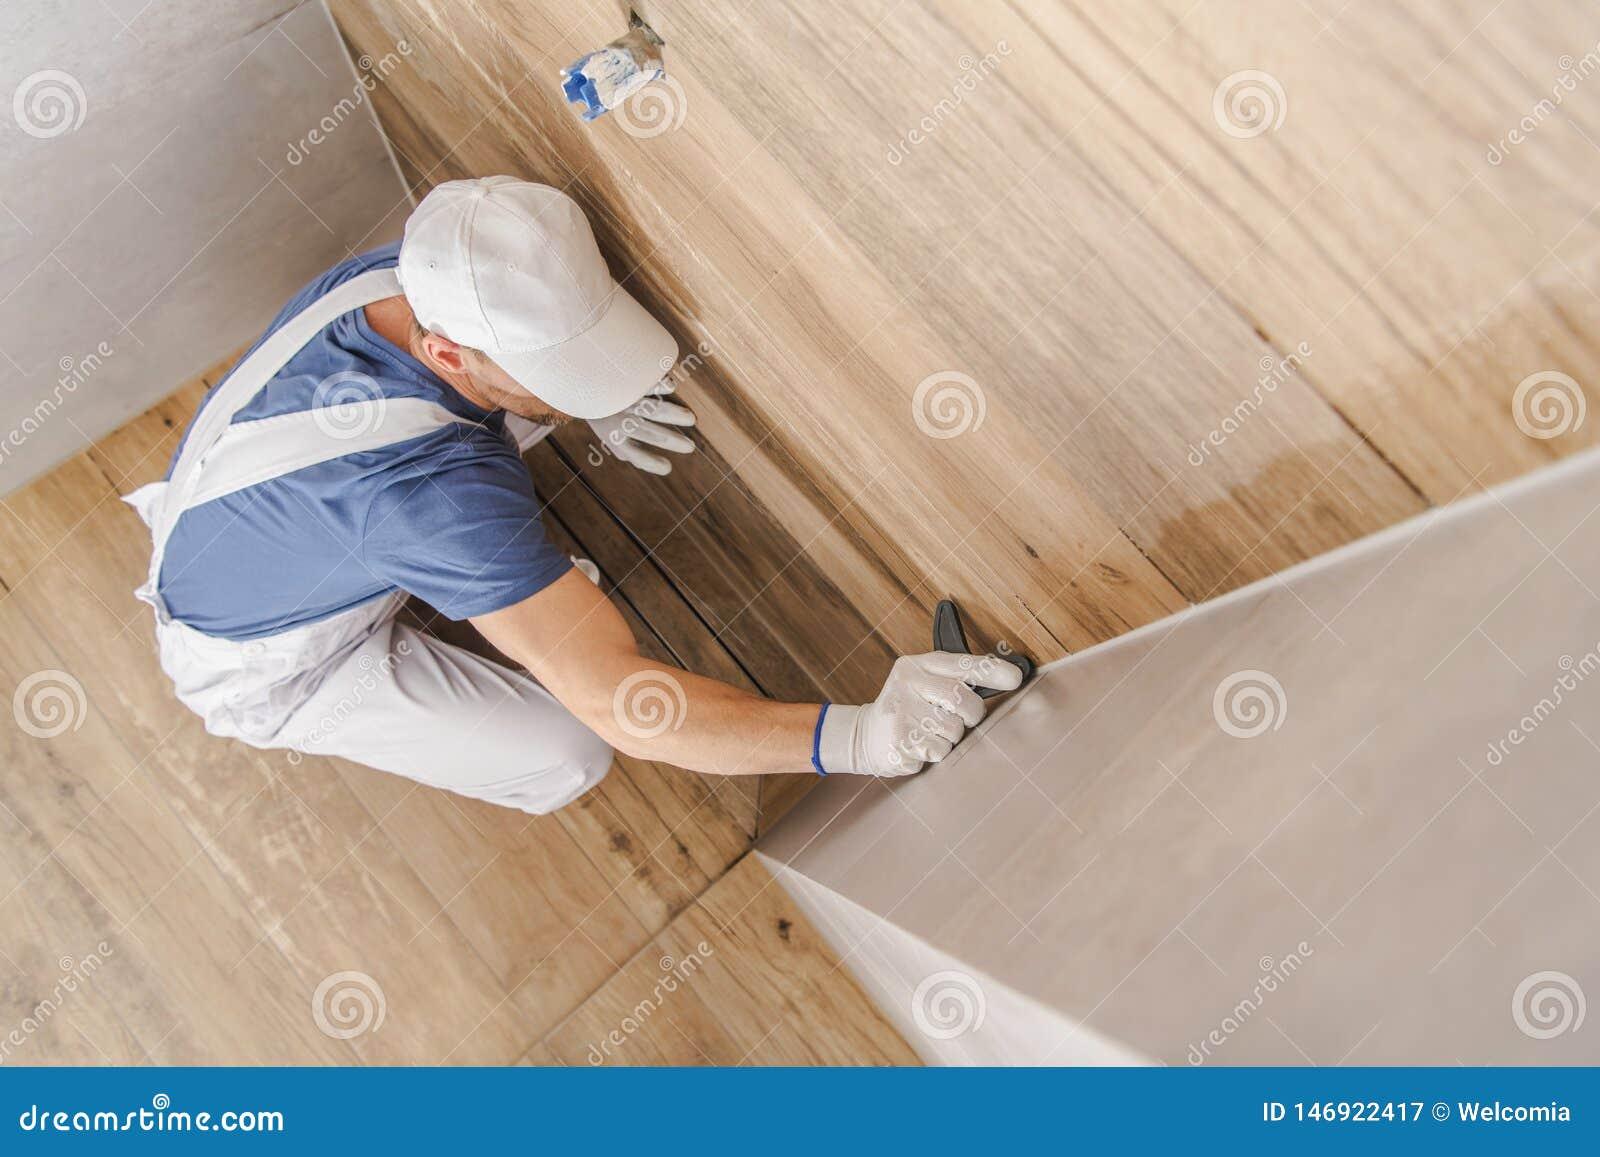 Sealing Finished Ceramic Tiles Stock Image Image Of Tile Wall 146922417